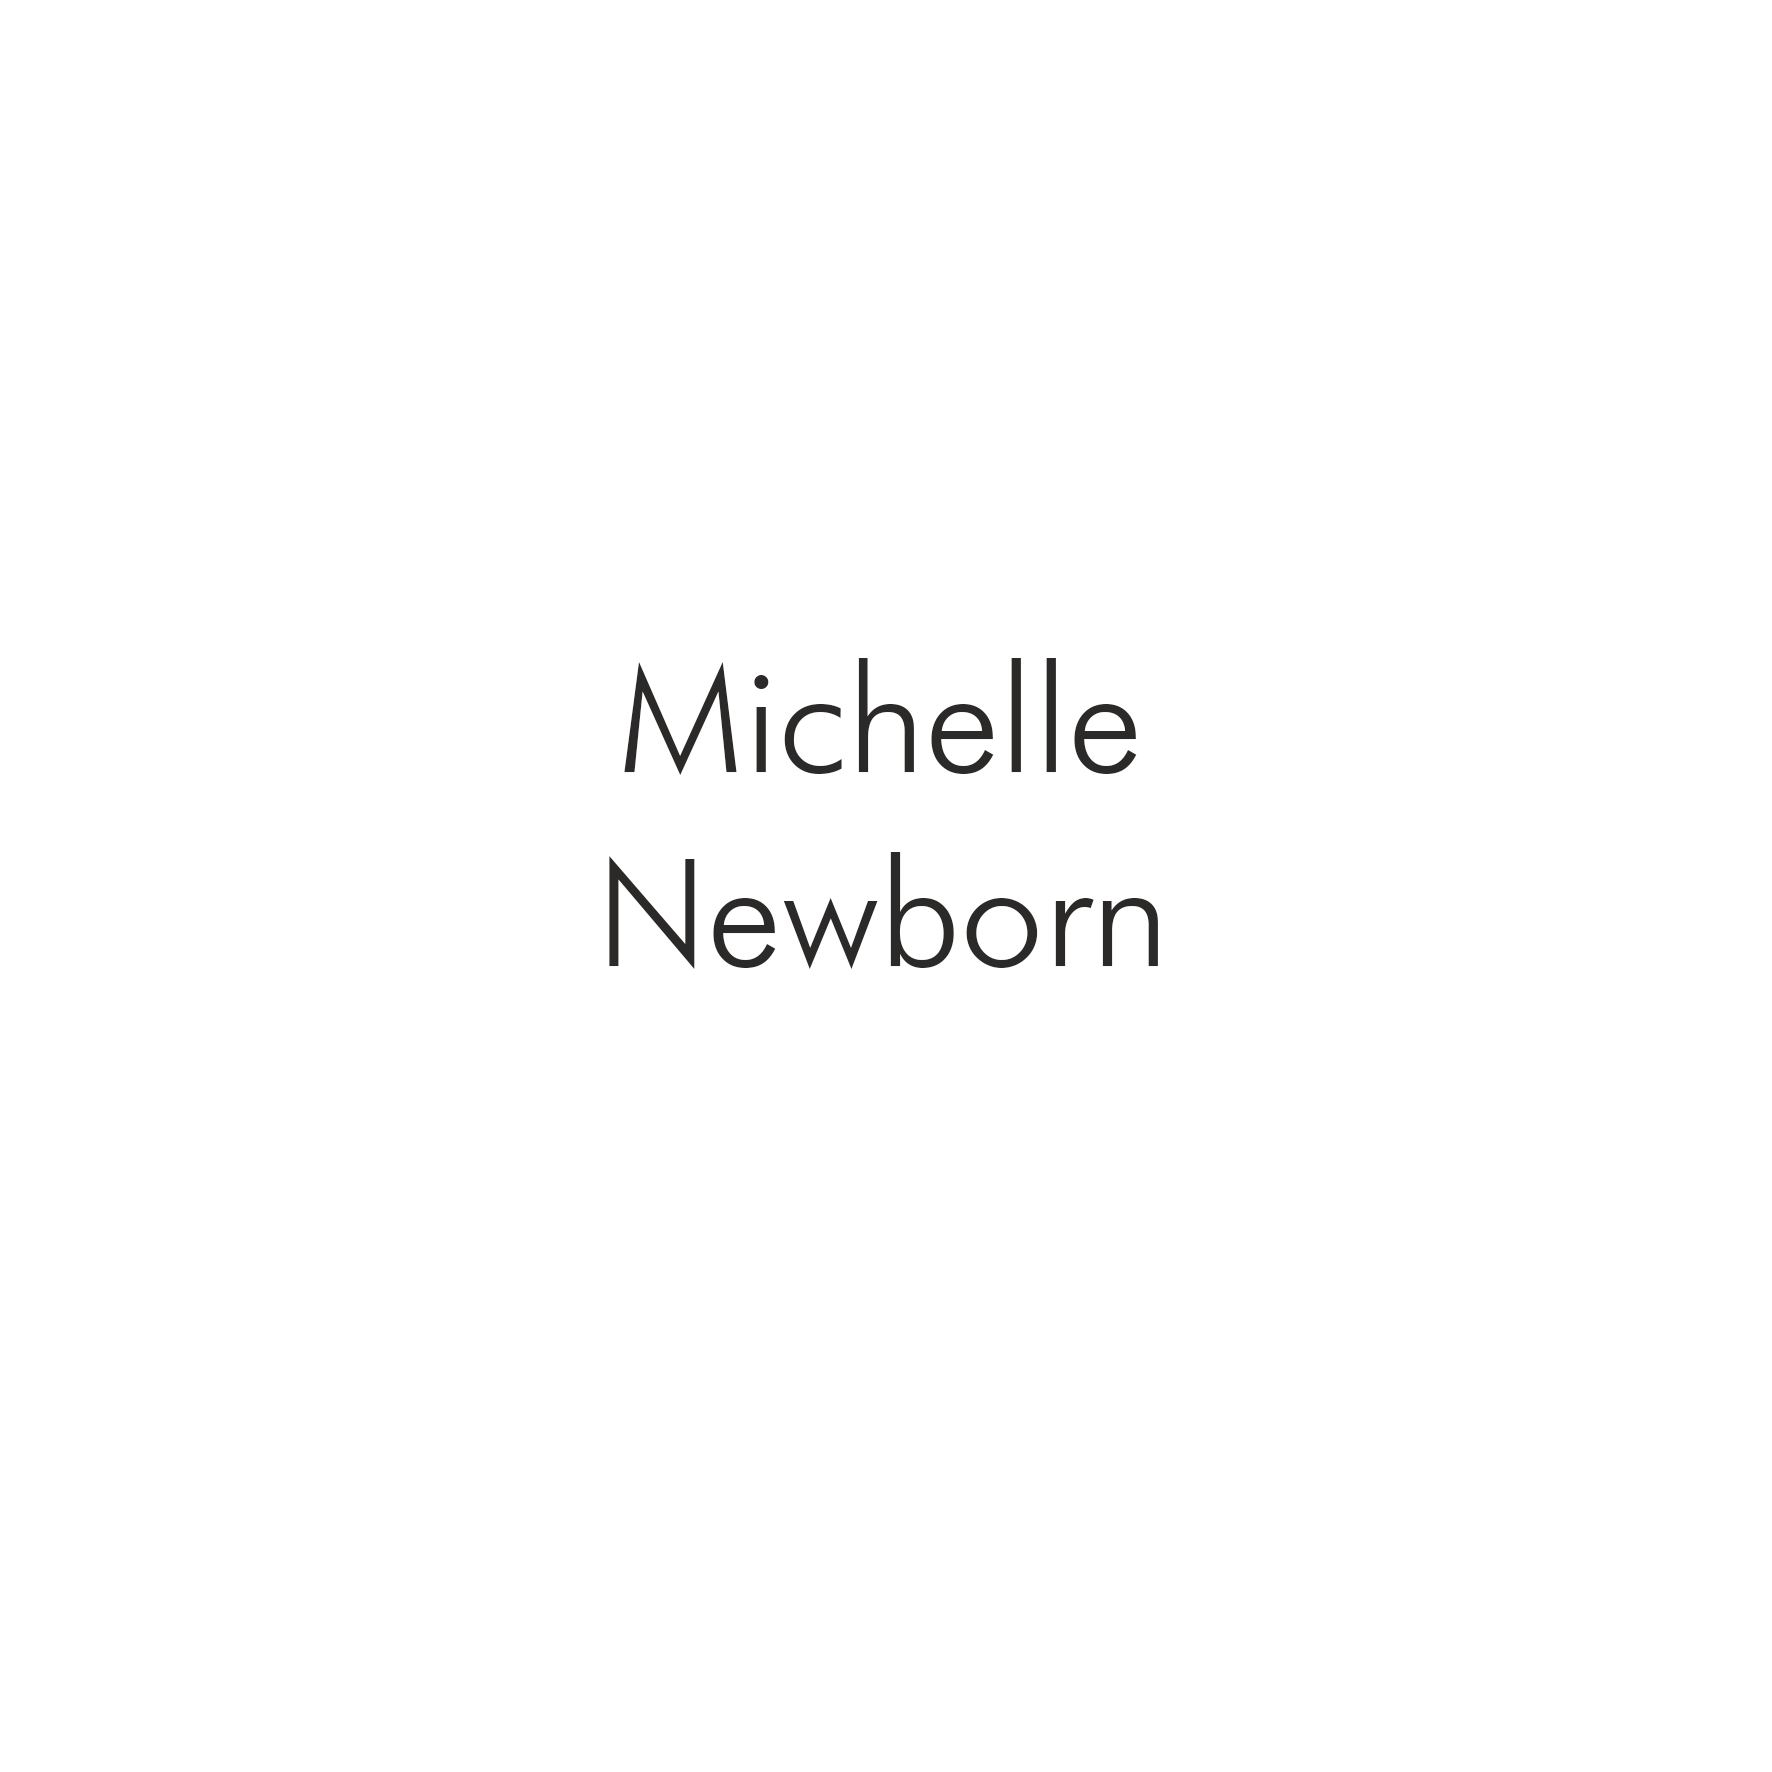 Michelle Newborn.png